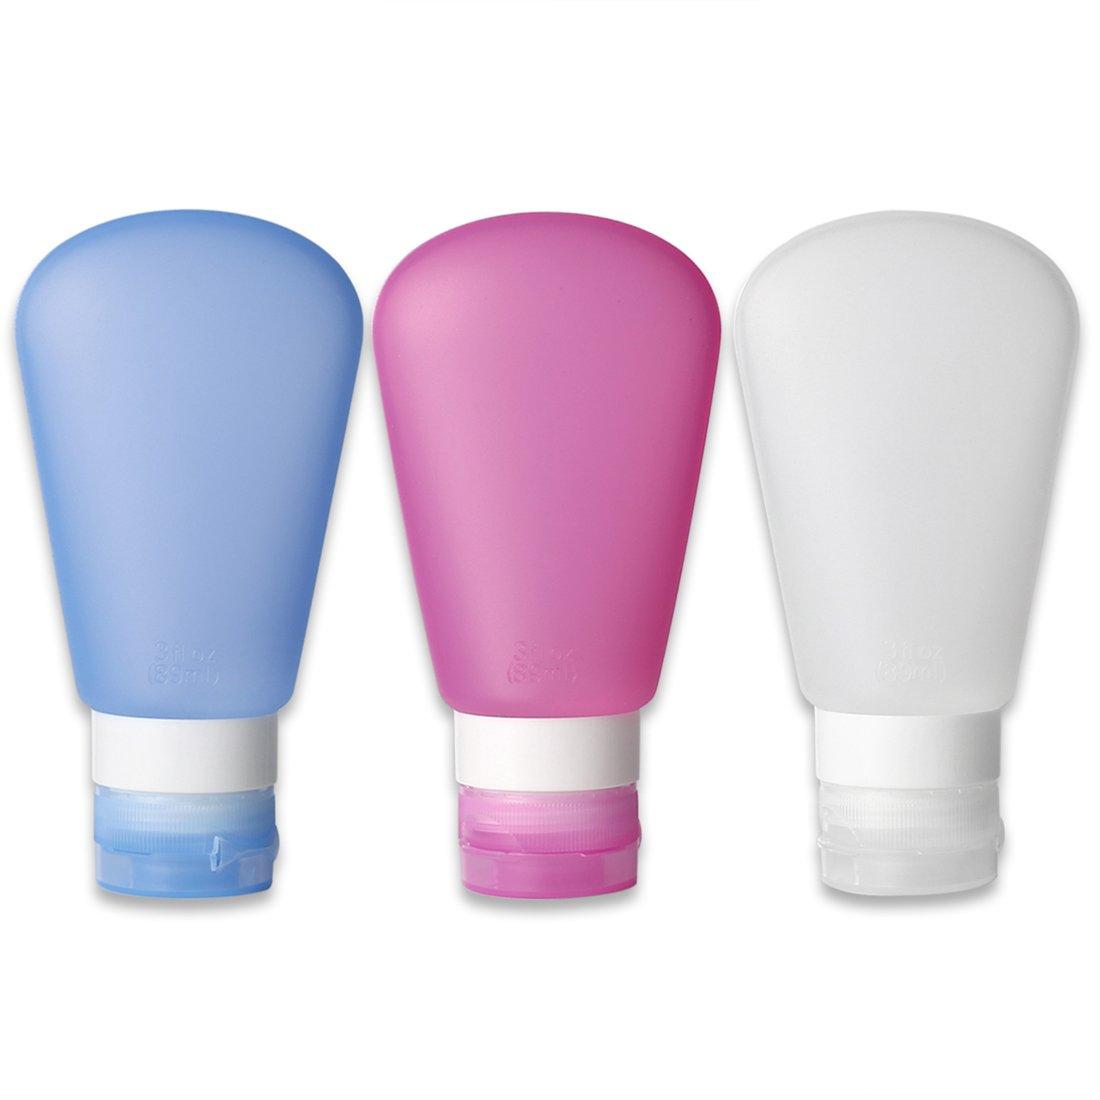 Kitdine Portable Soft Silicone Travel Bottles Set (3 OZ, Pink + White + Blue)